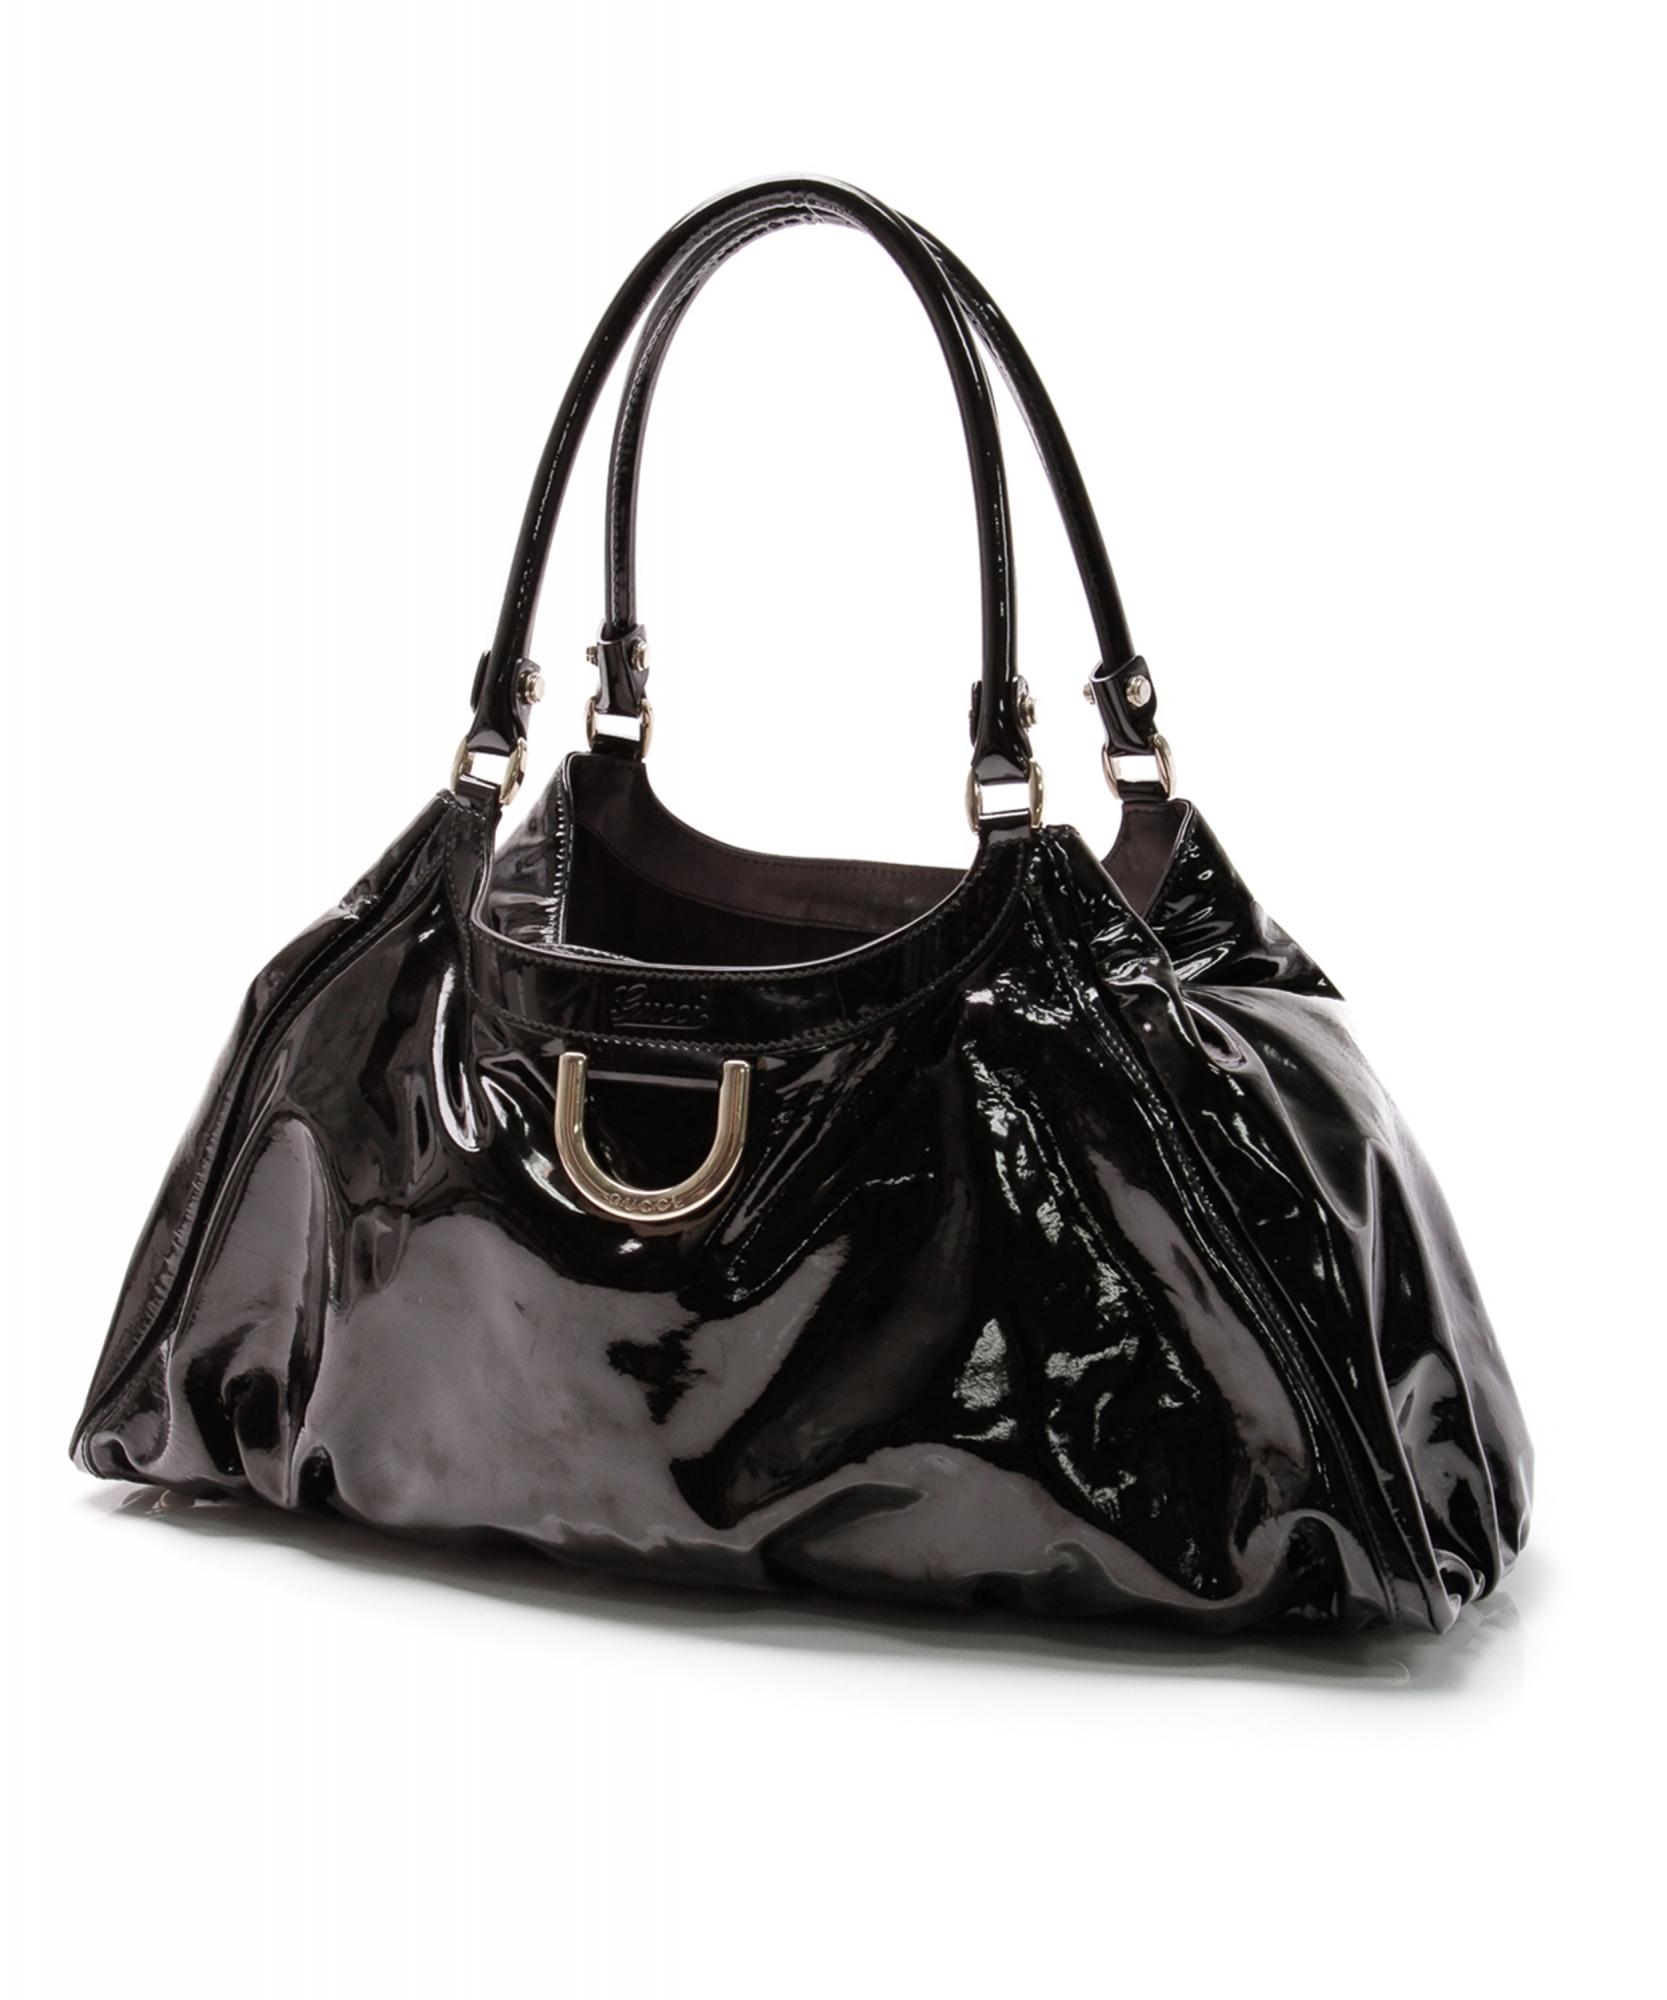 ede50f93a916 Gucci Black Patent Leather D Ring Hobo Bag | La Doyenne